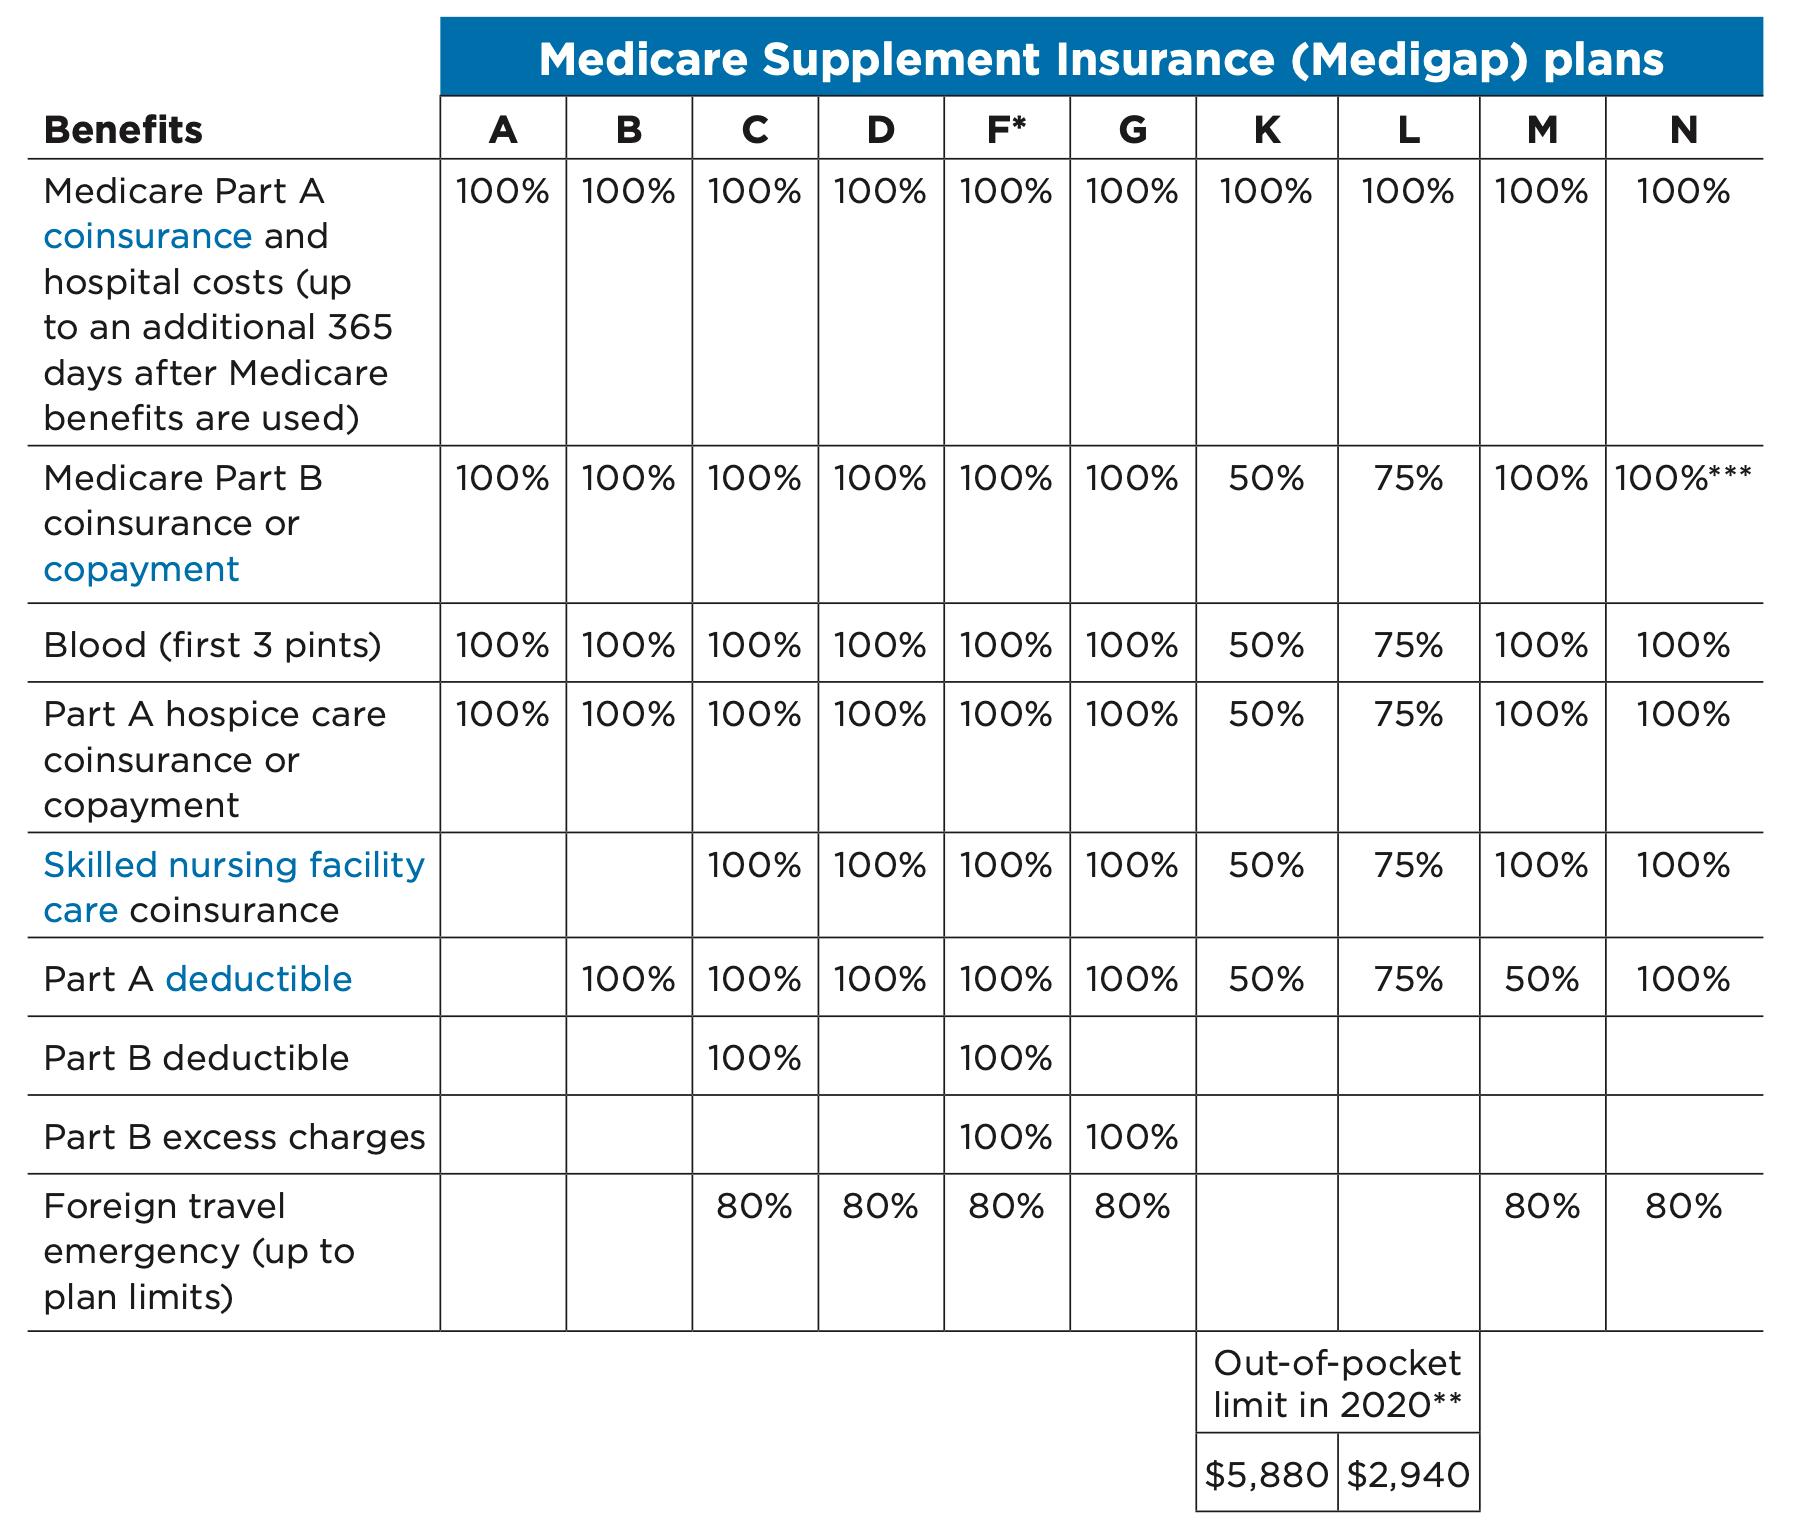 A chart of Medicare Supplement Insurance plans (Medigap plans)